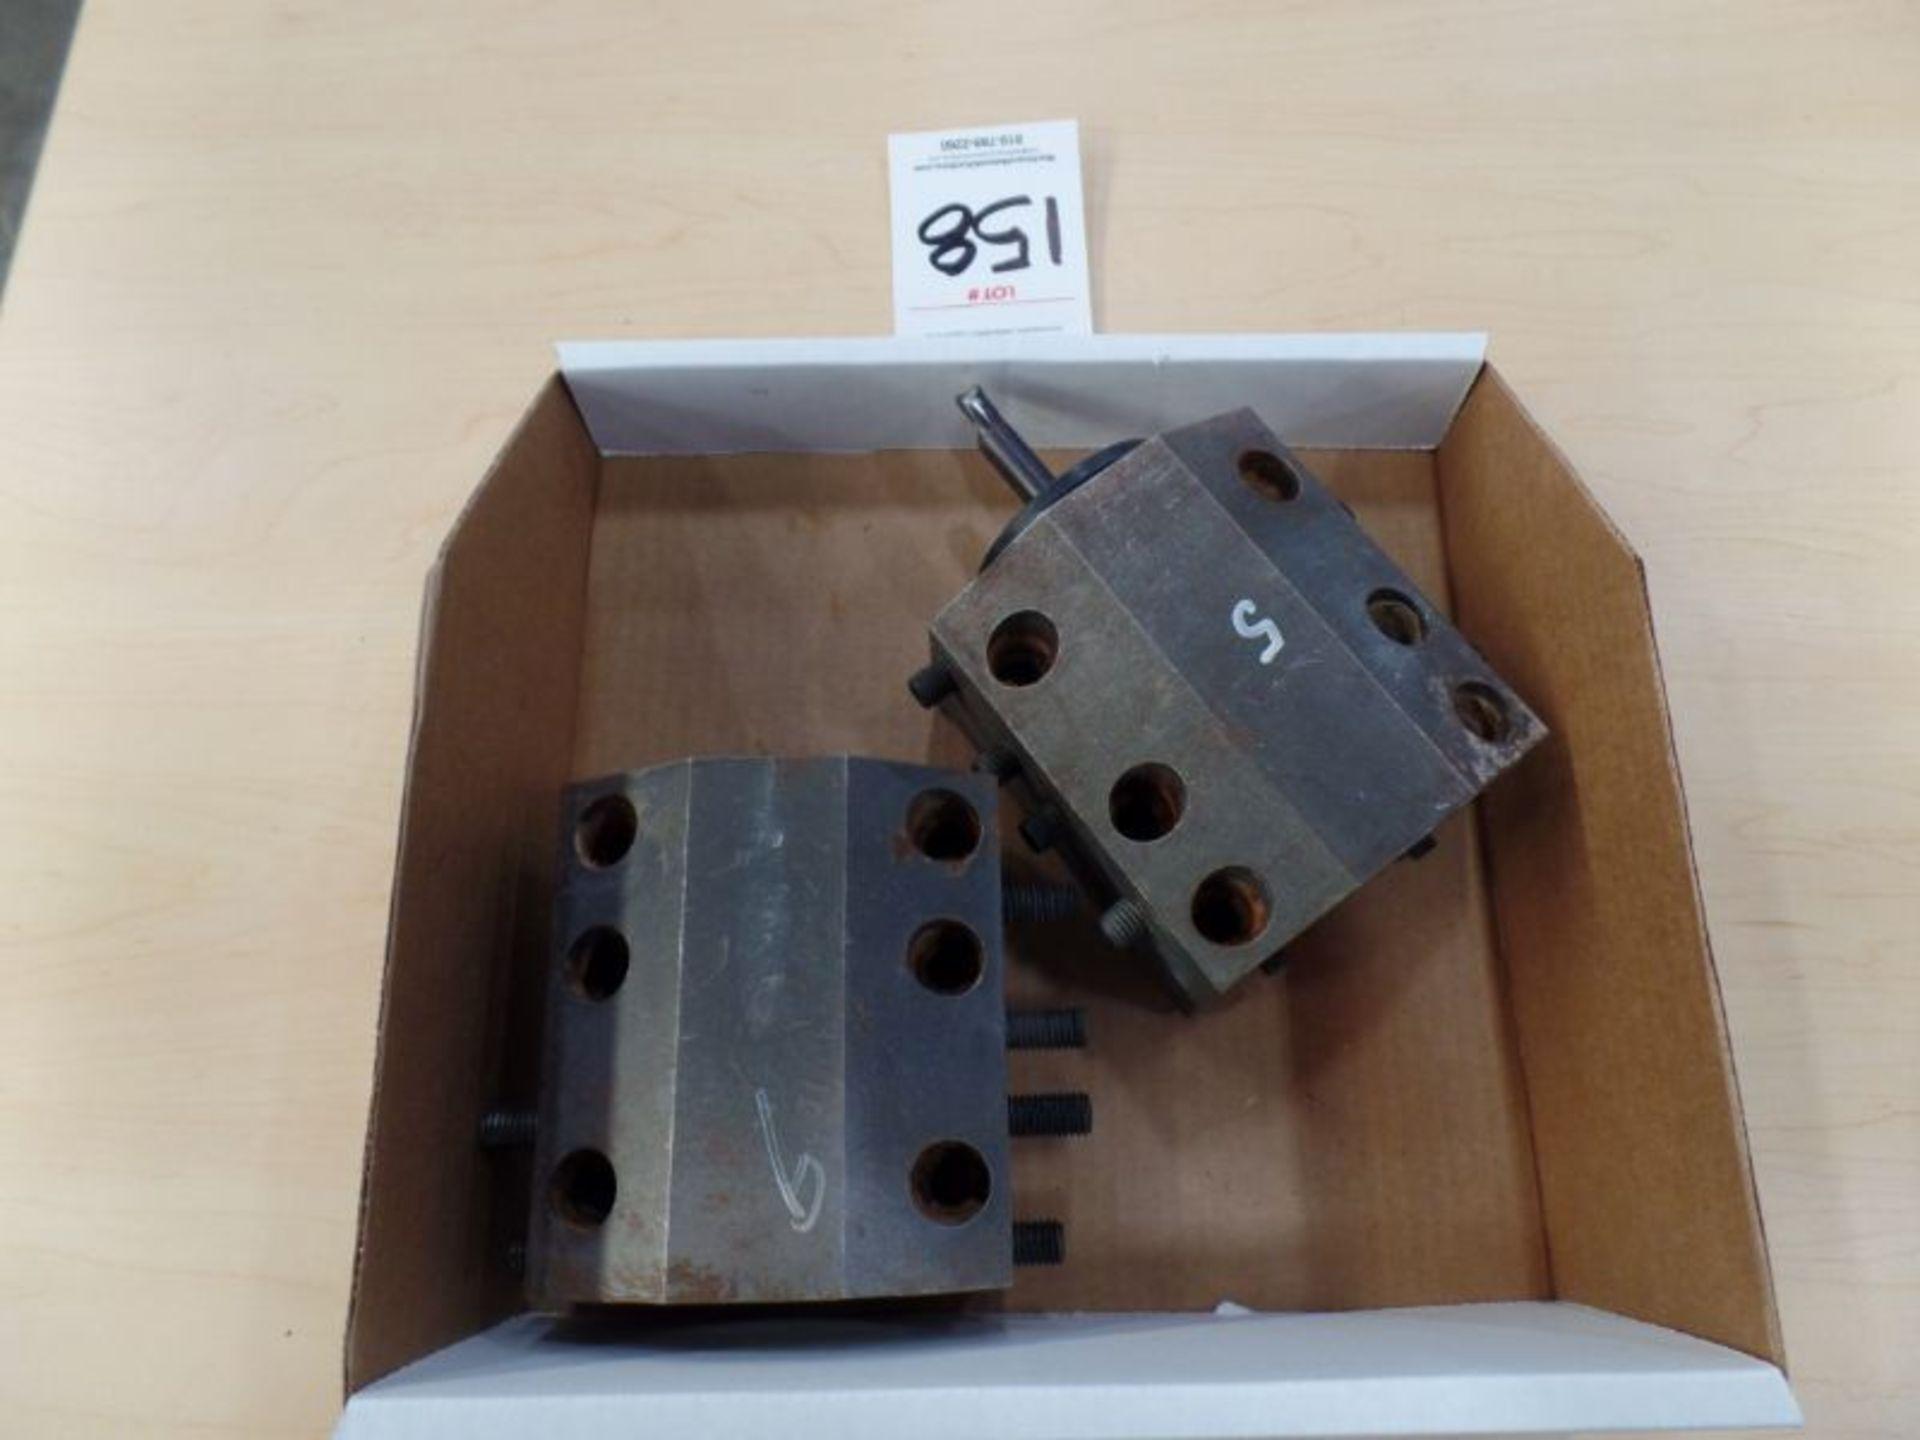 OD/ID Tool Holder with tool for Doosan Puma 400LC - Image 4 of 4